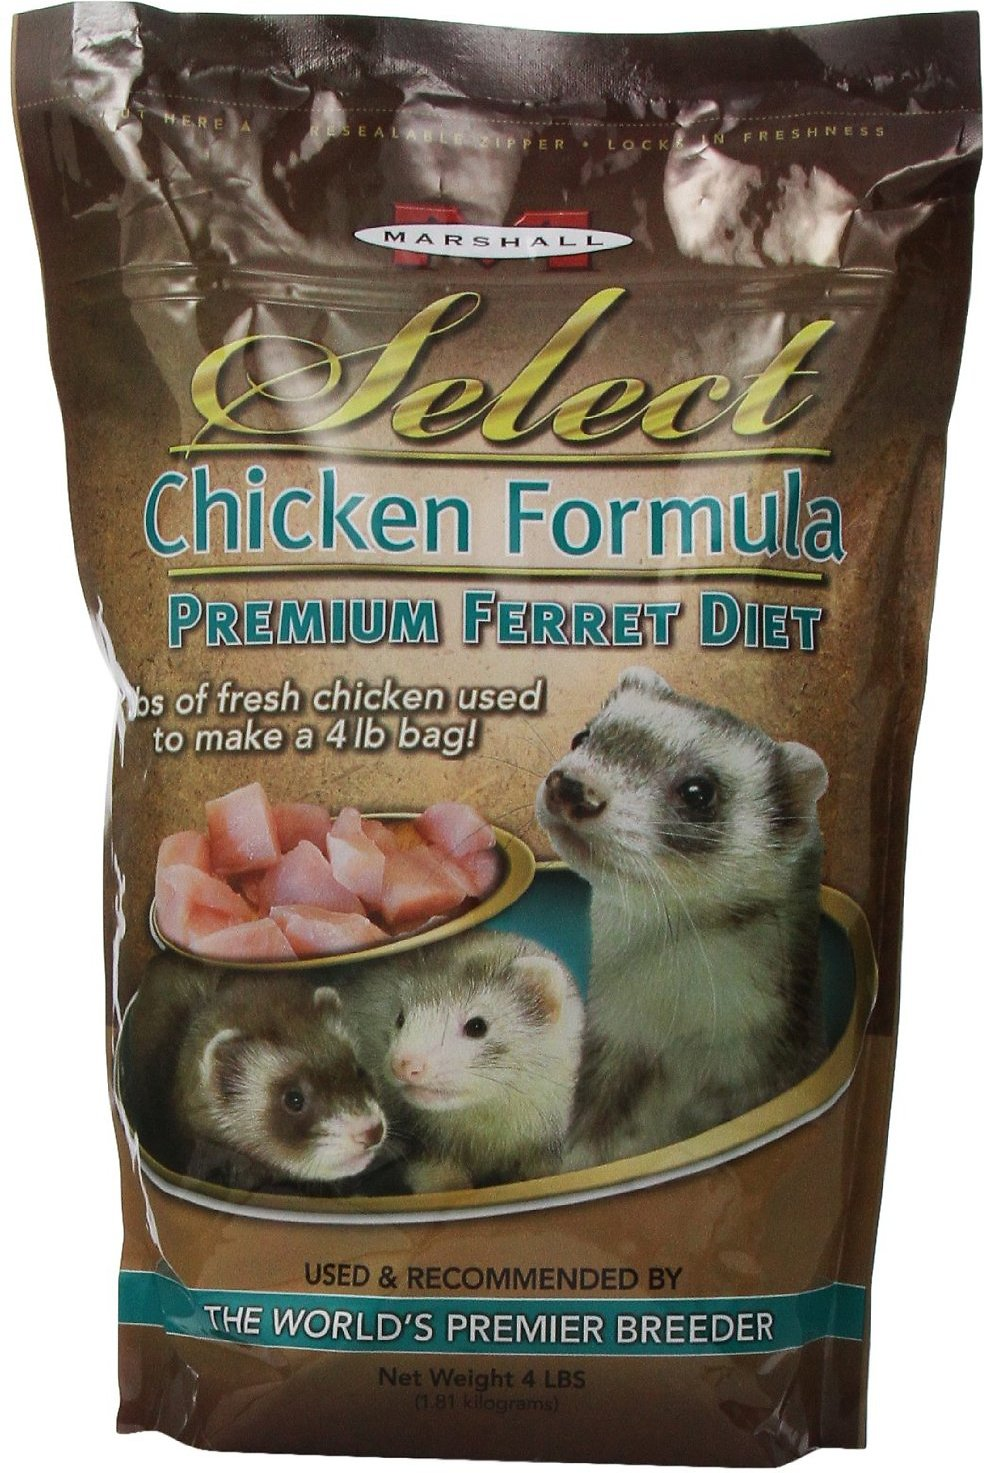 Marshall Select Chicken Formula Ferret Food, 4-lb bag